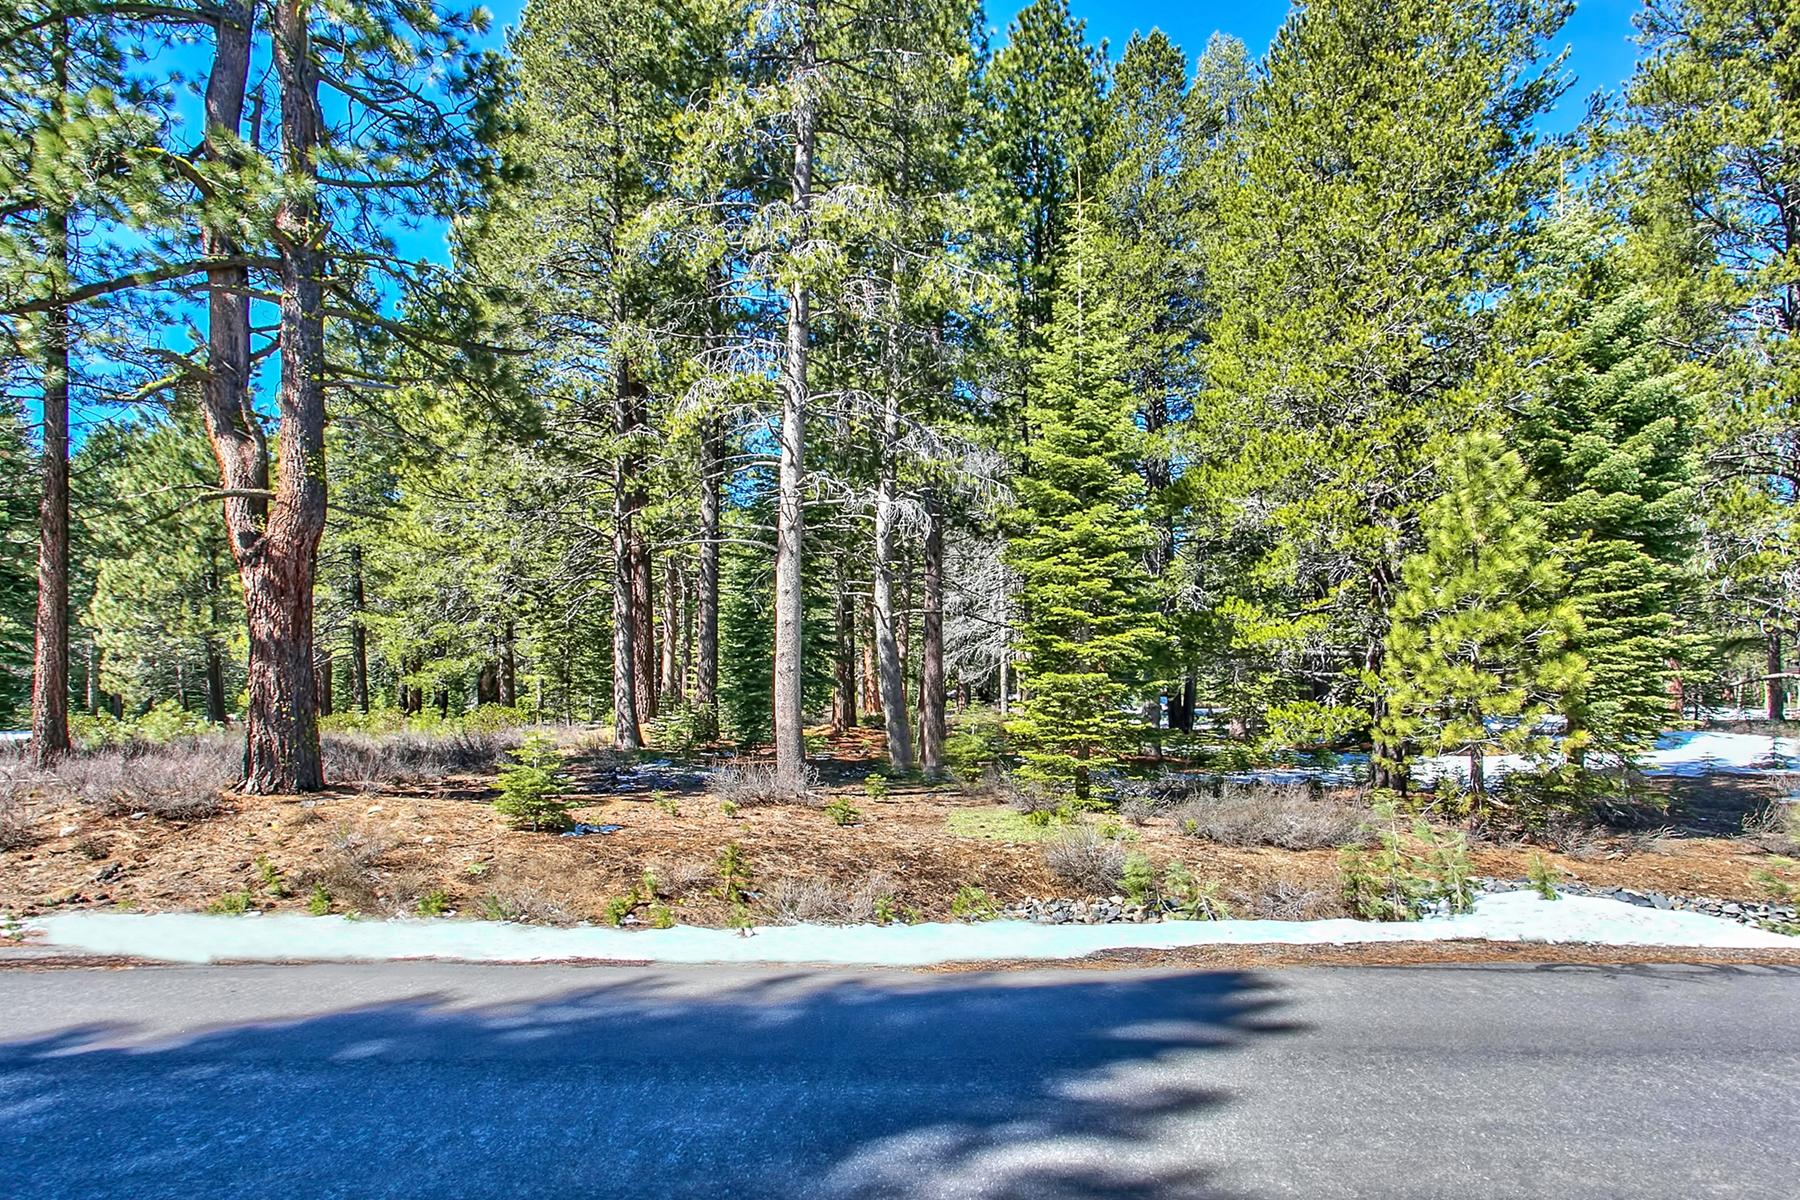 Additional photo for property listing at 11830 Bottcher Loop W57  特拉基, 加利福尼亚州 96161 美国